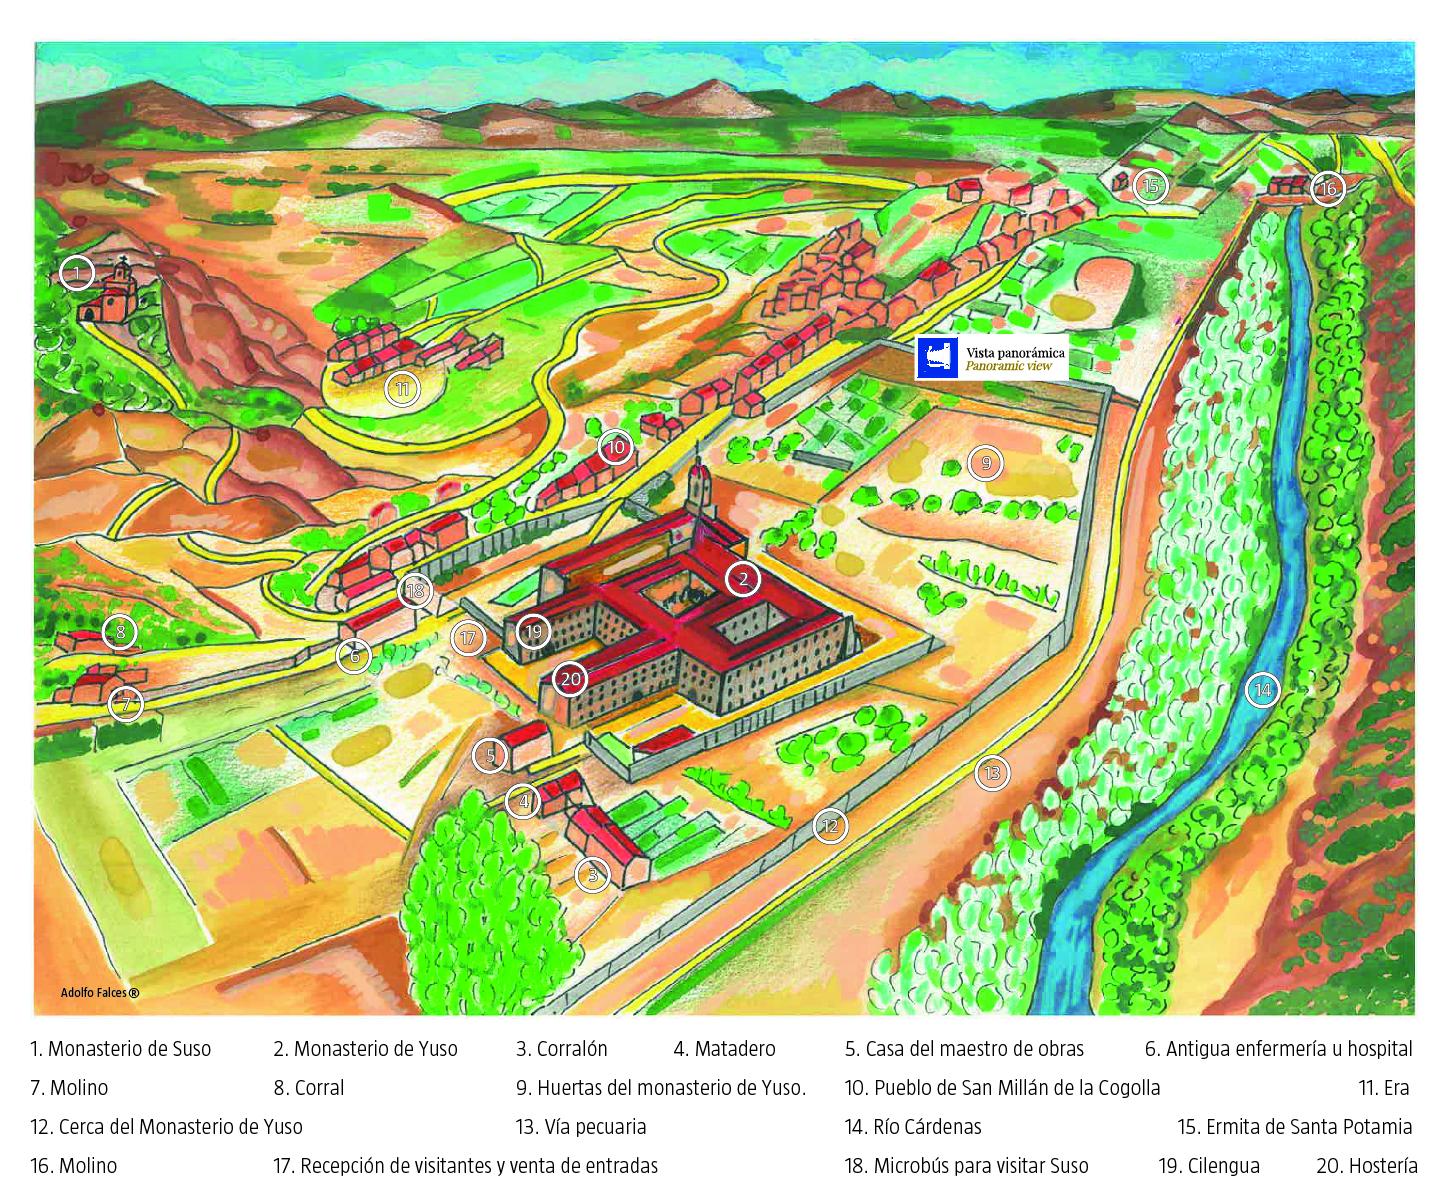 Plano de monasterios de San Millán